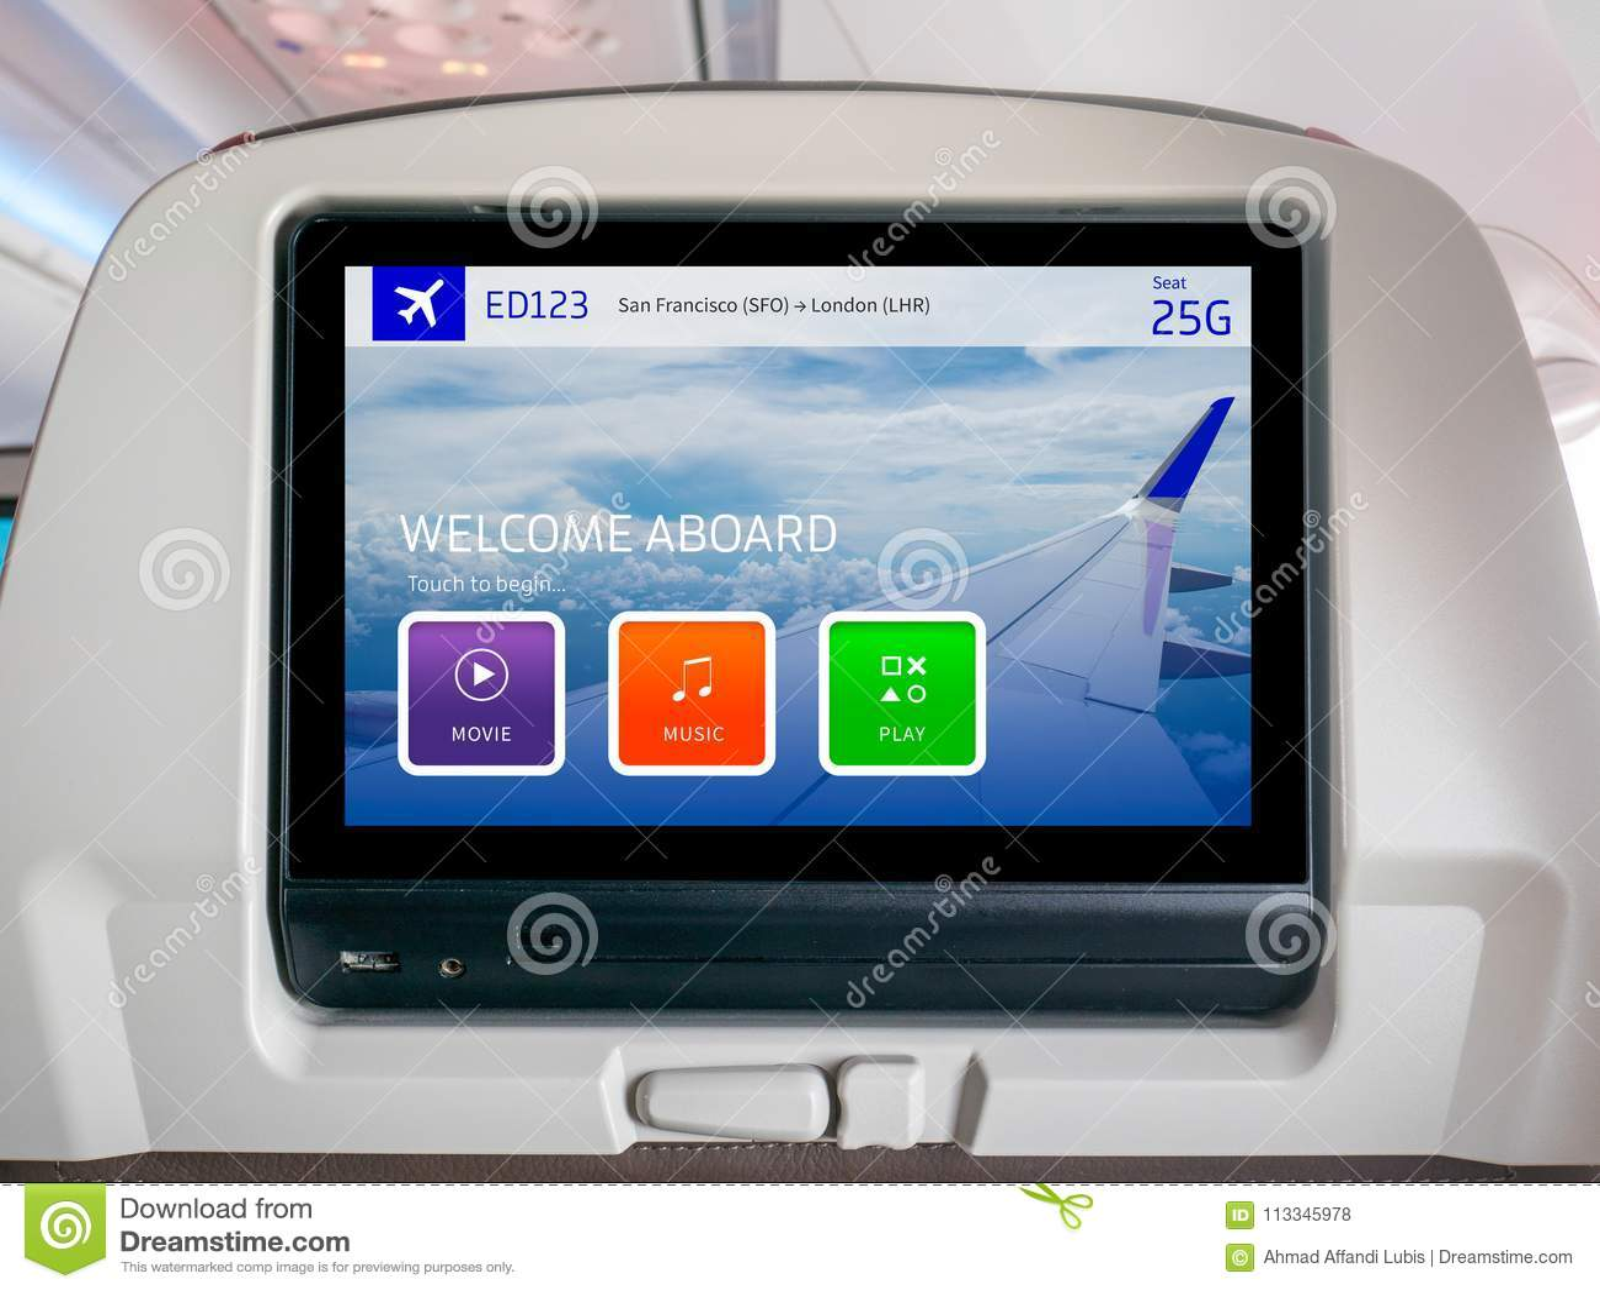 In-Flight Entertainment Screen, Inflight Screen, Seatback Screen in Airplane